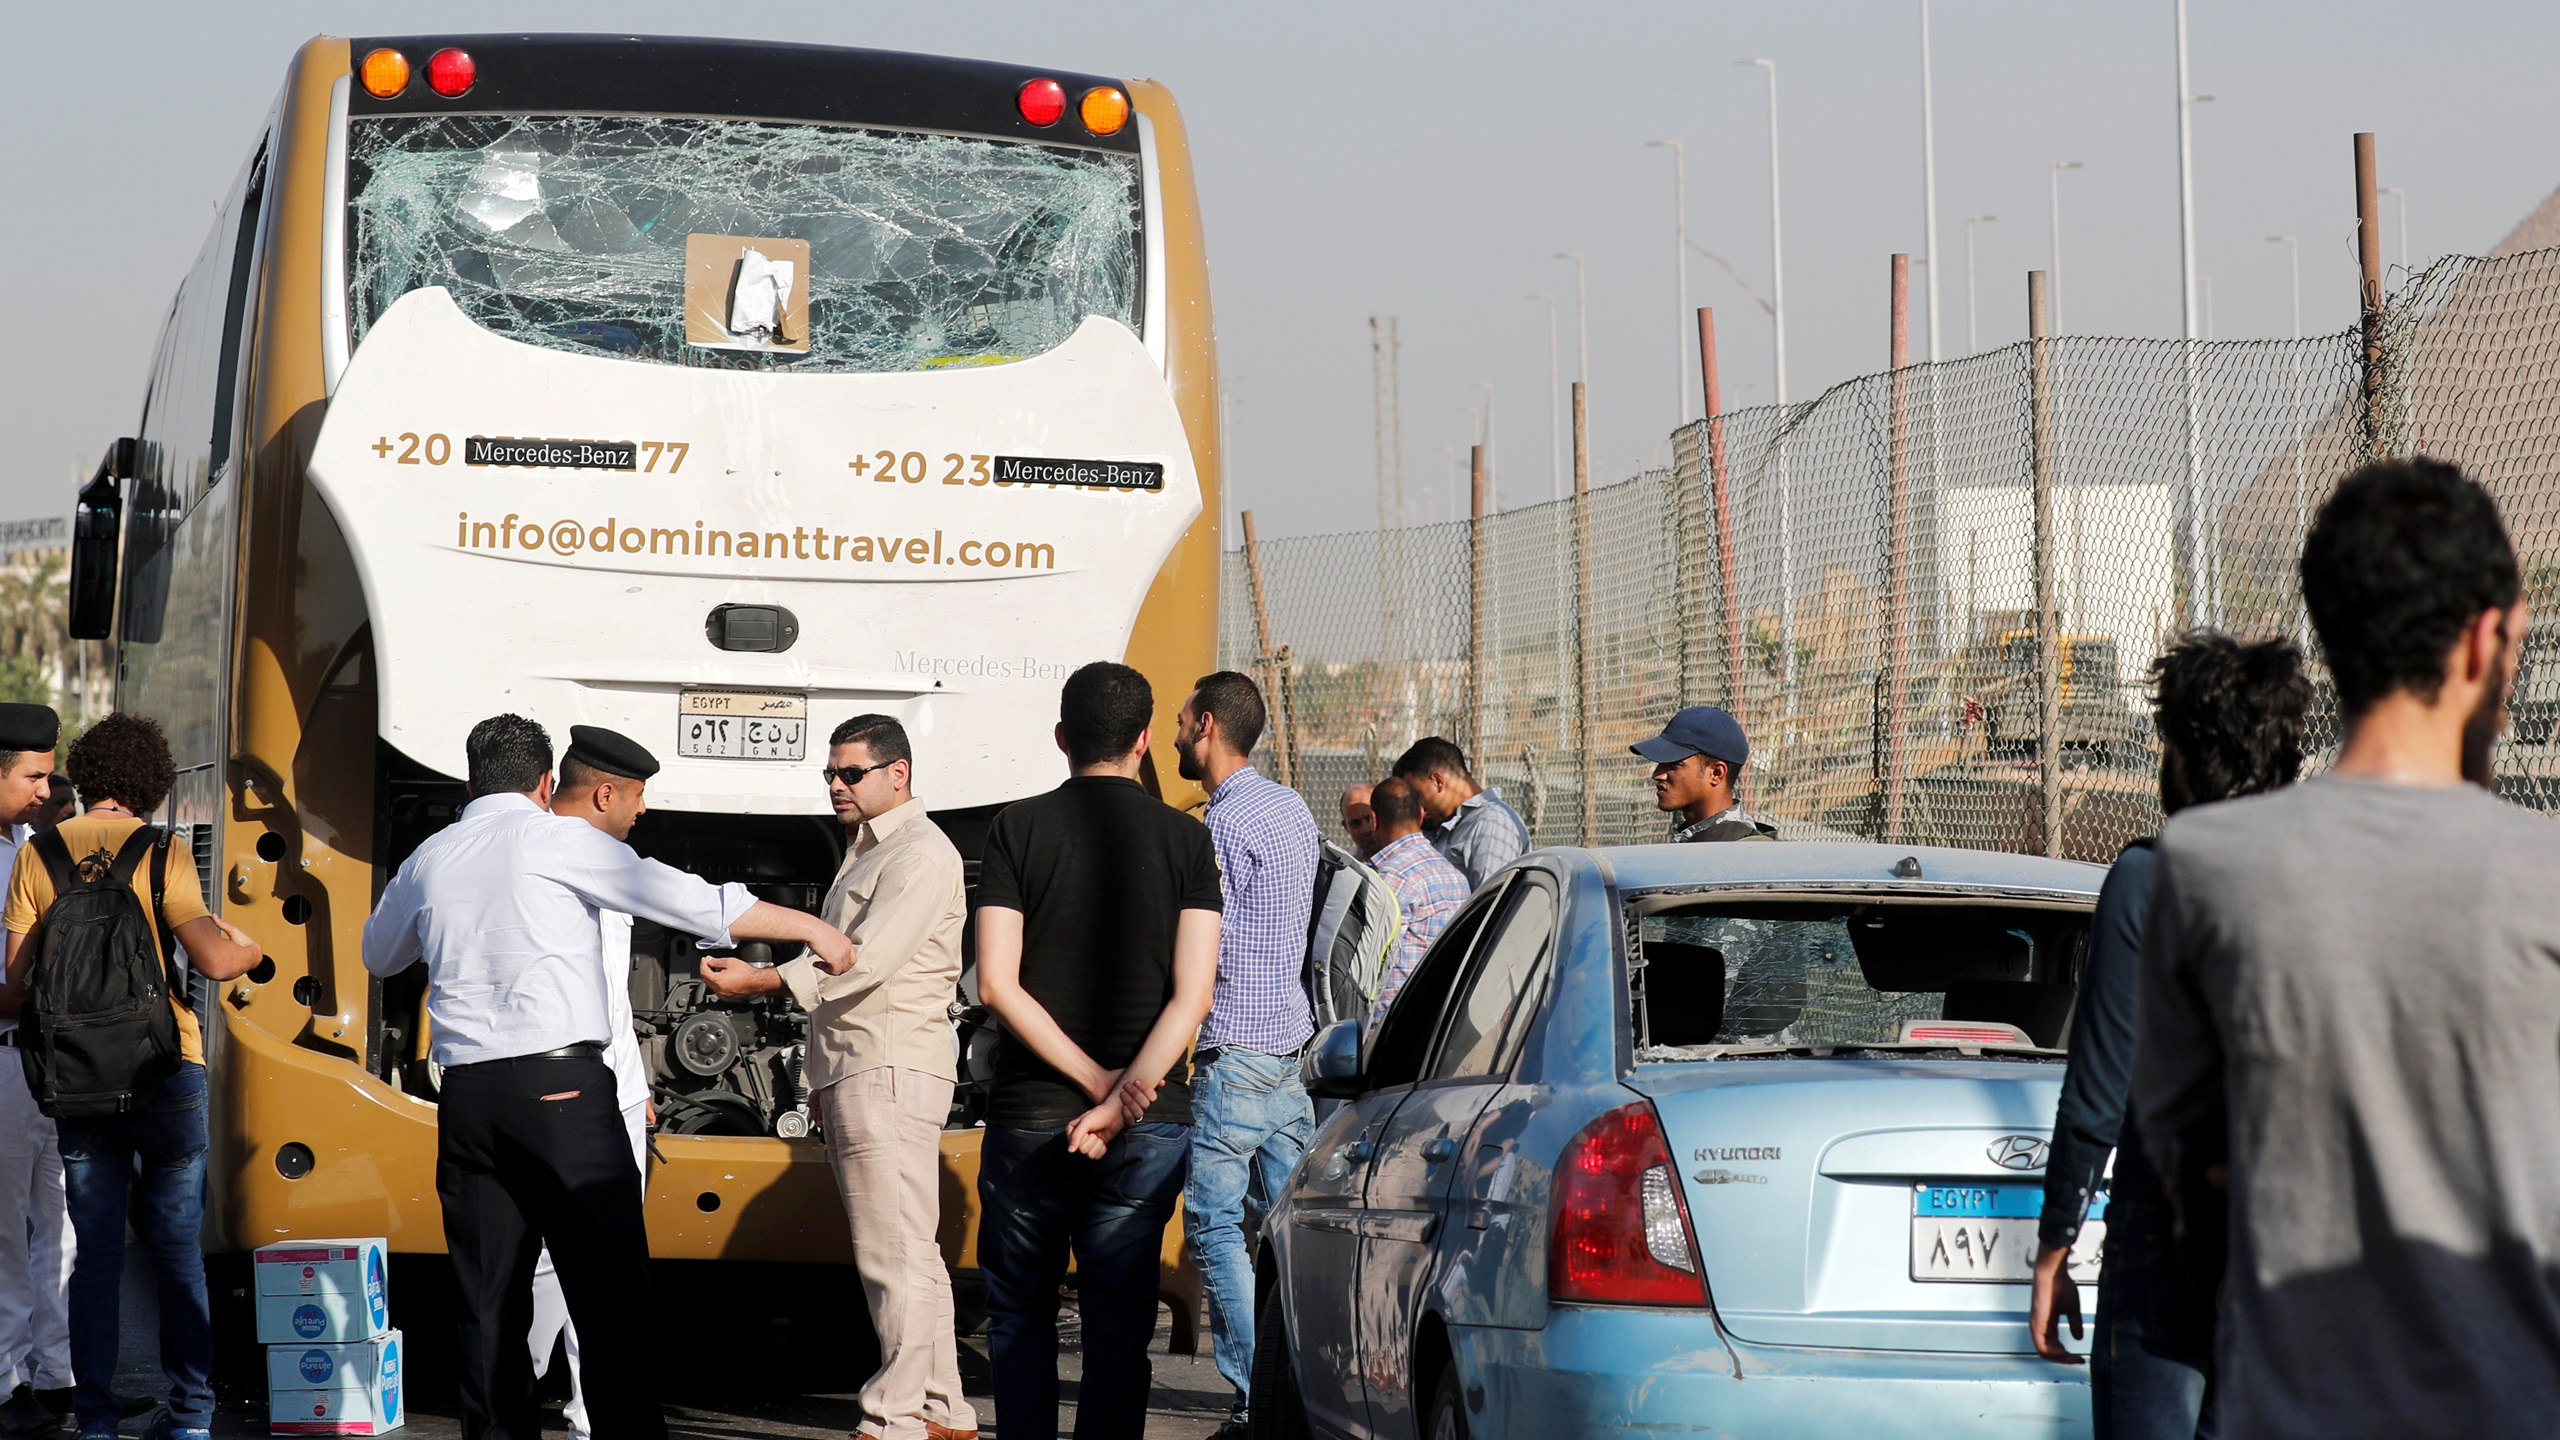 Explosión hiere a turistas junto a pirámides de Giza en Egipto